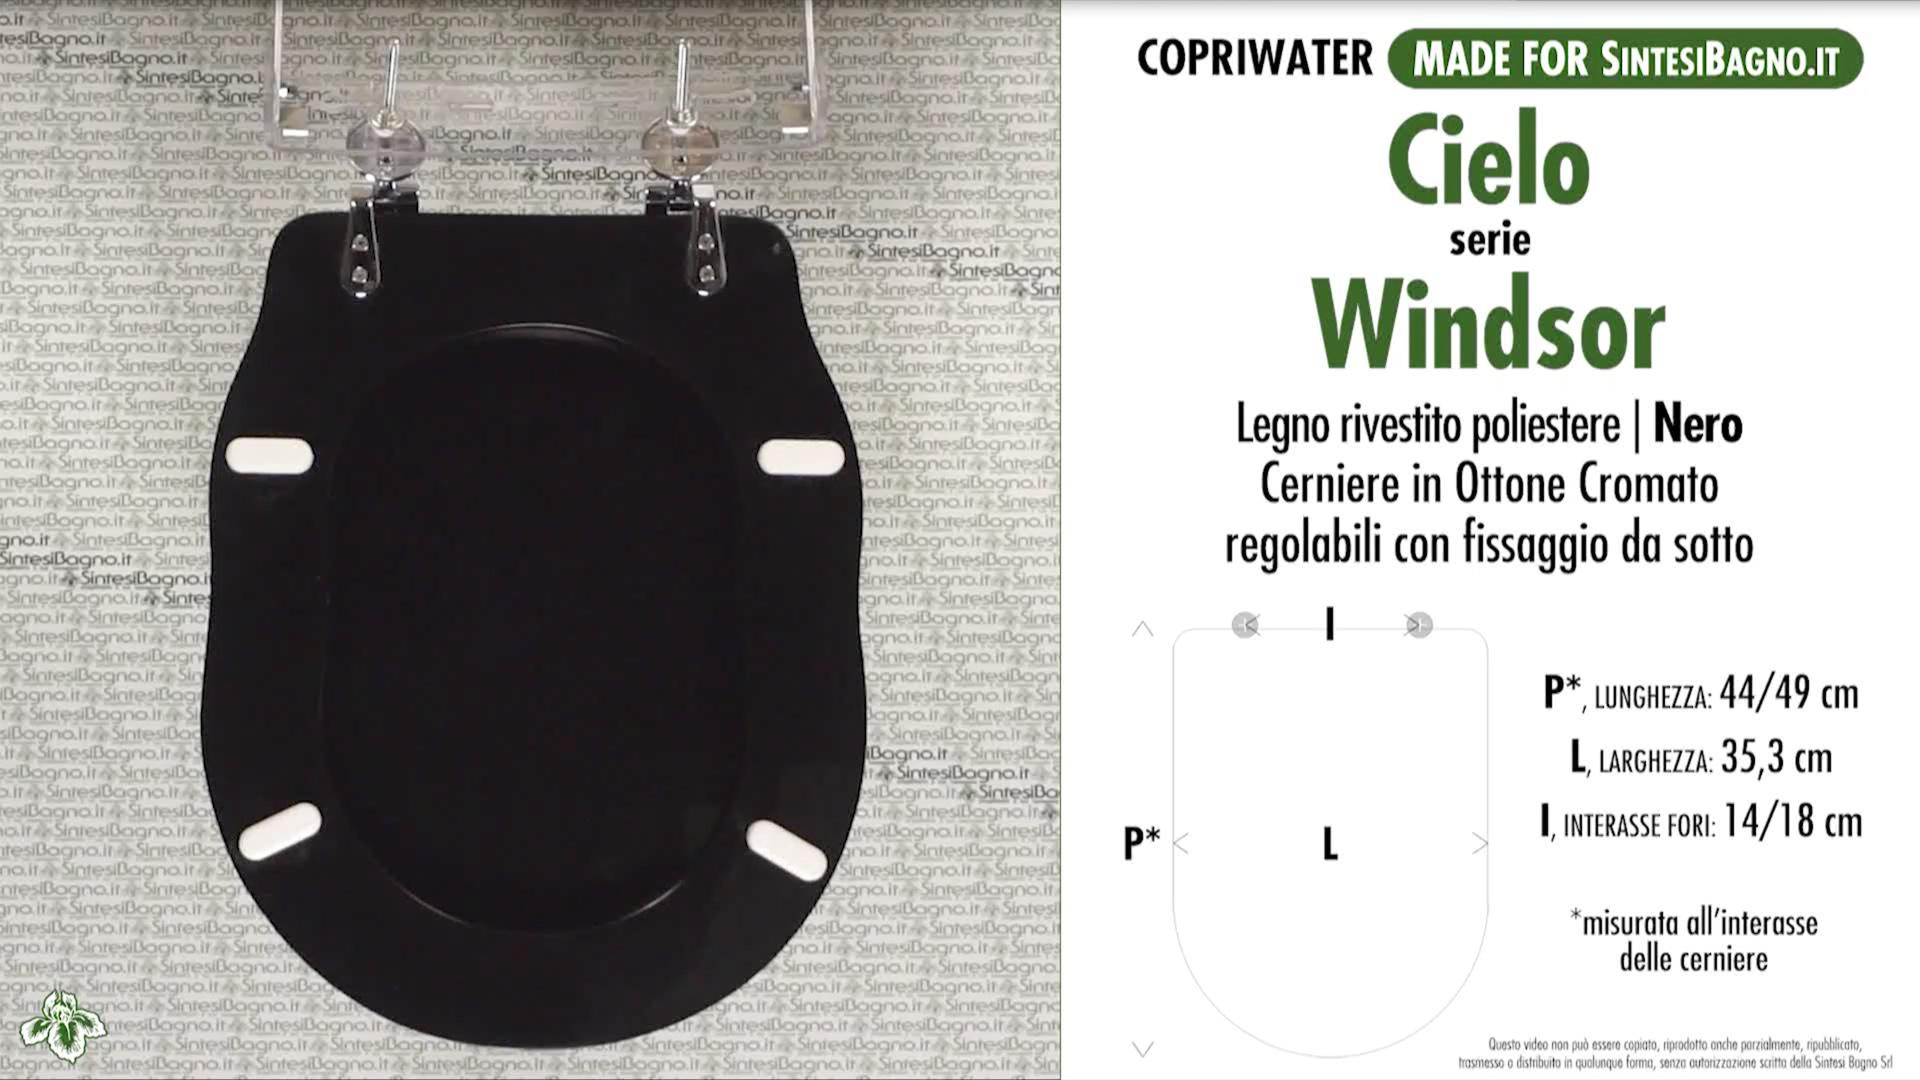 Ceramica Cielo Serie Windsor.Copriwater Per Wc Windsor Cielo Nero Ricambio Dedicato Legno Rivestito Sintesibagno Shop Online